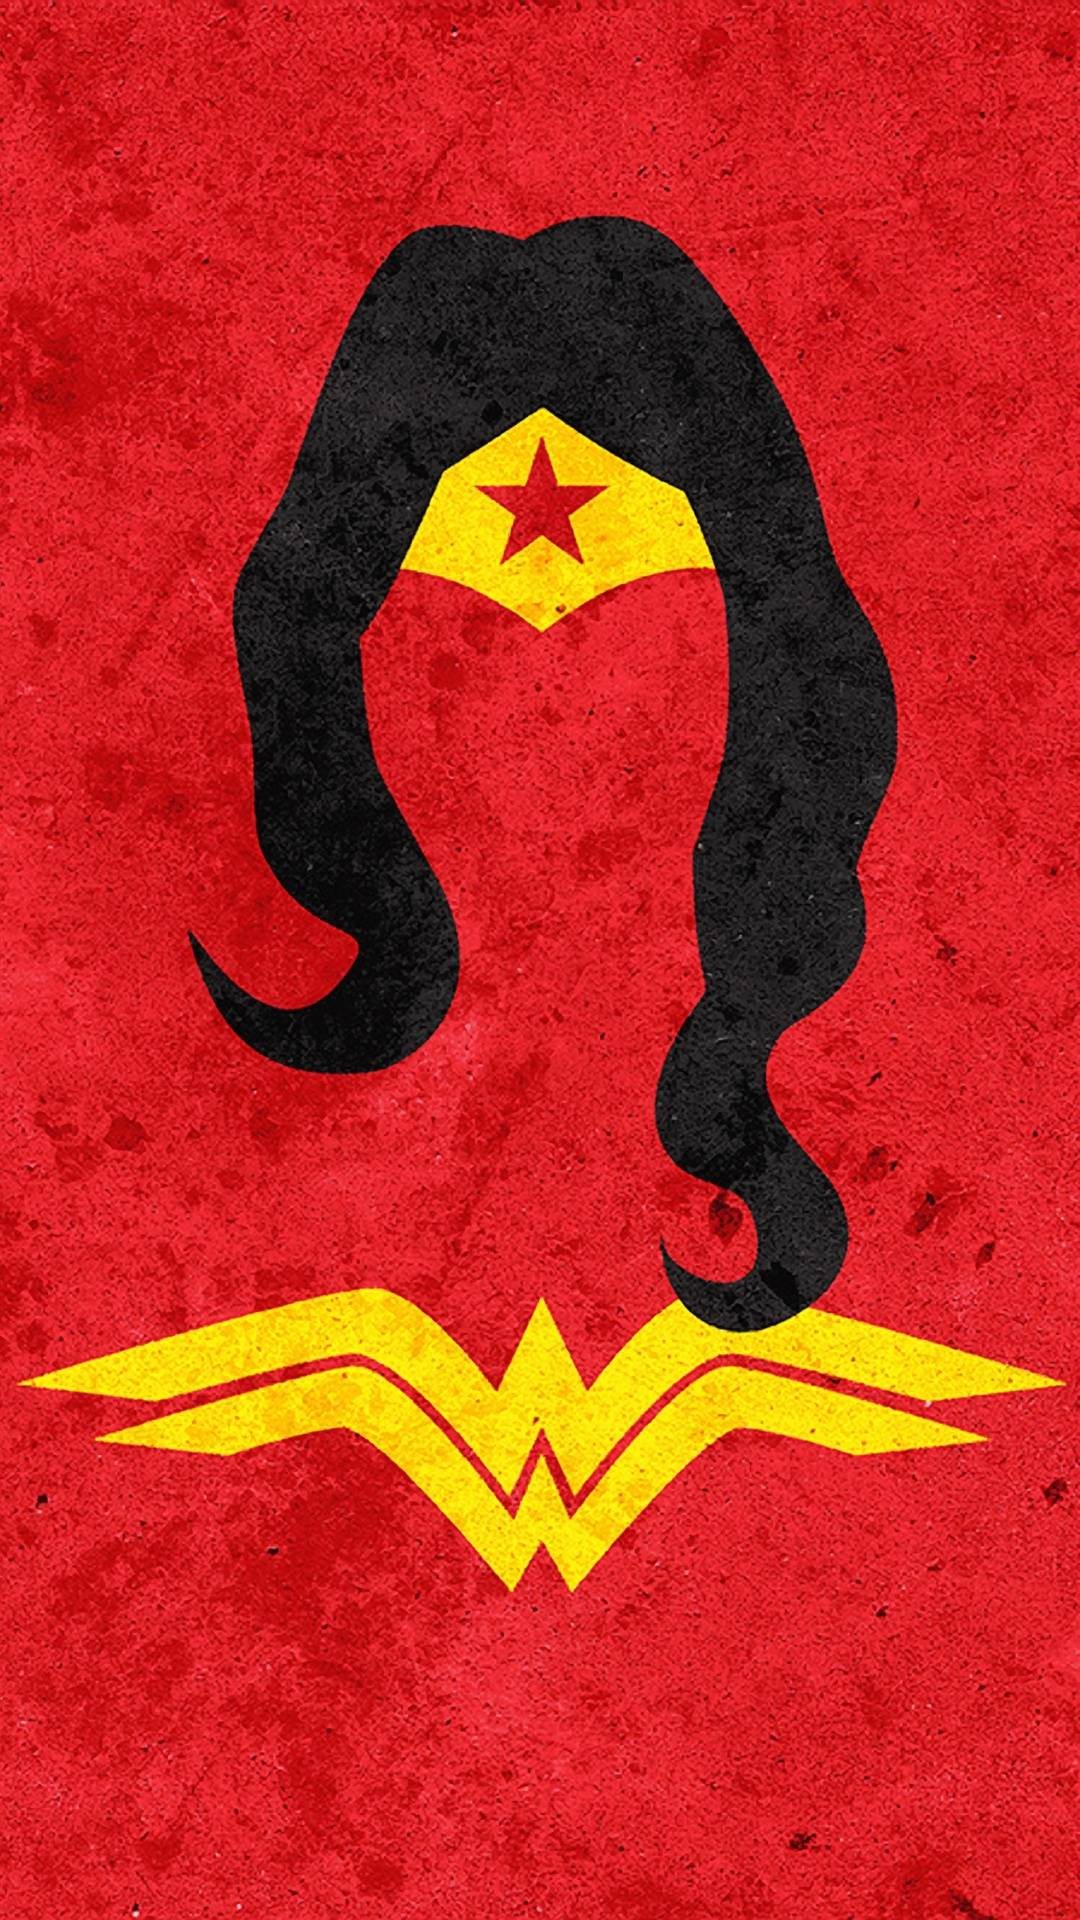 Wonder Woman Logo Wallpaper   Viewing Gallery 1080x1920